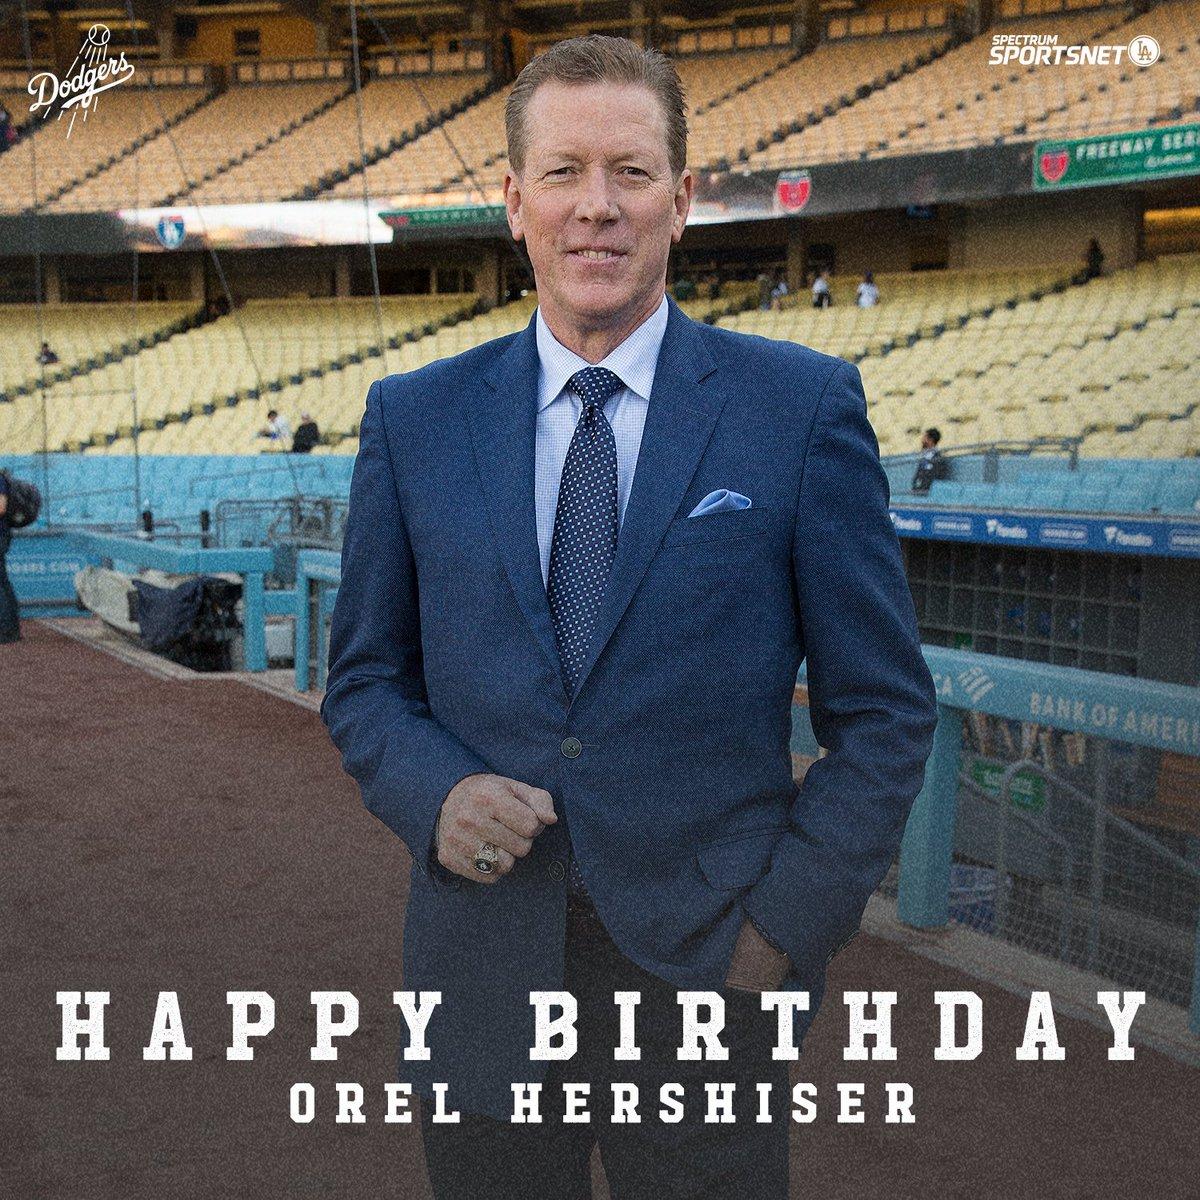 Help us wish Dodger great @OrelHershiser a very happy birthday! 🎂